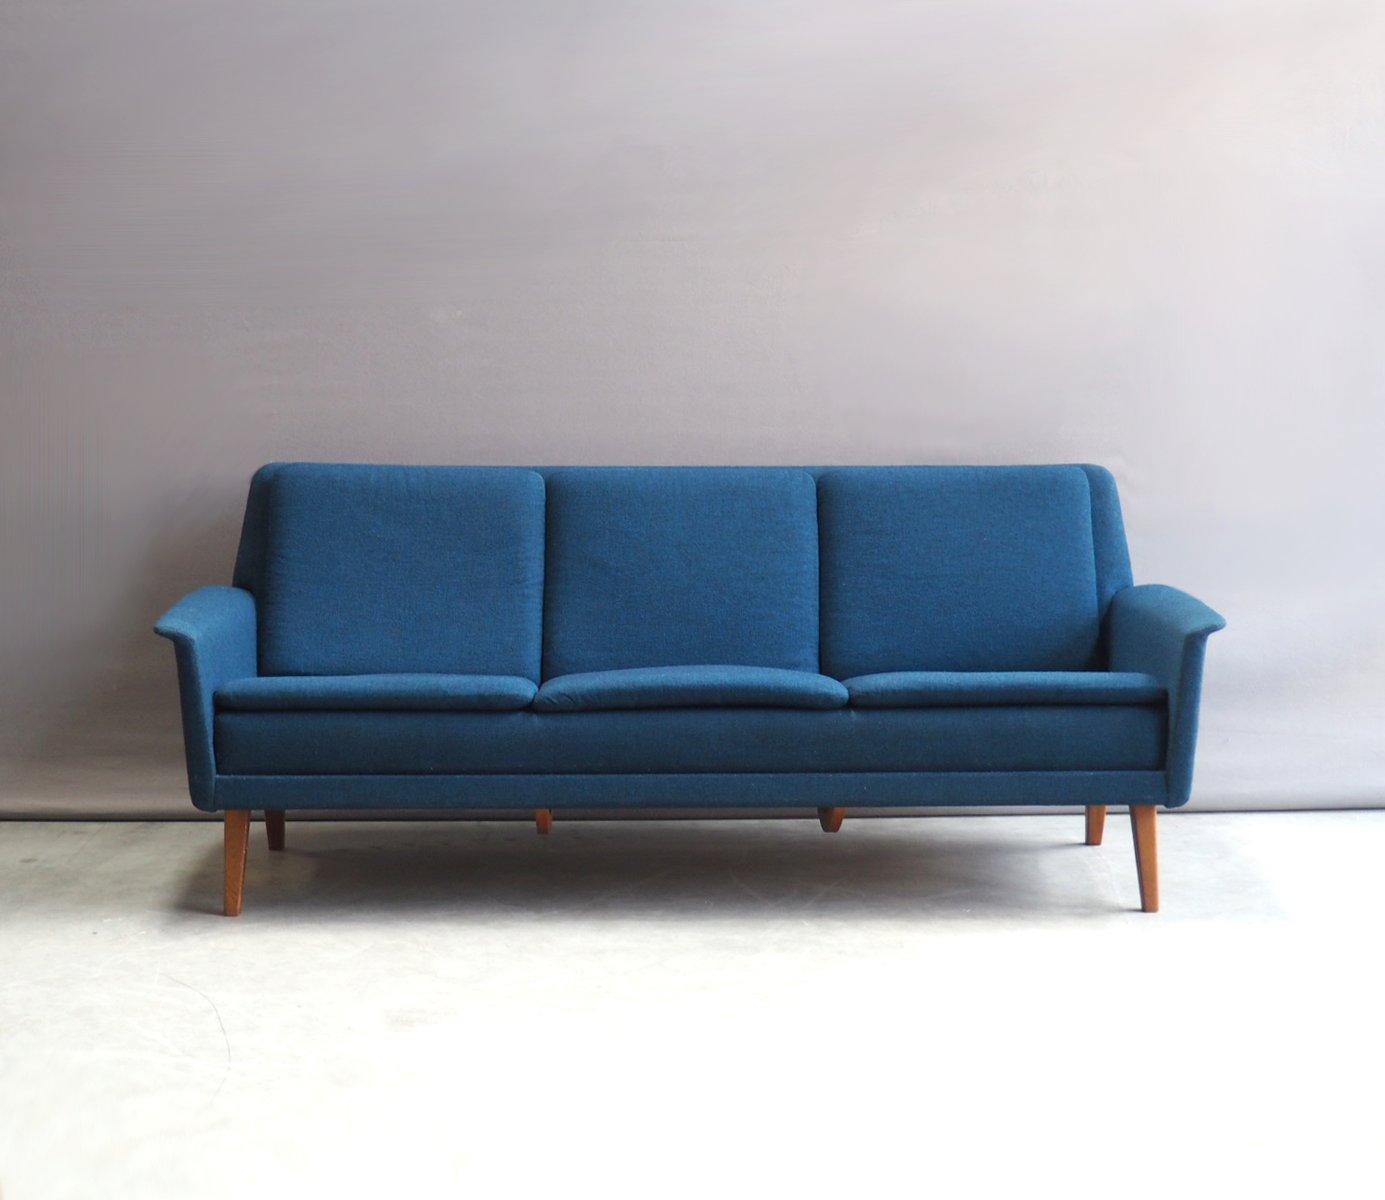 5654 sofa von folke ohlsson f r fritz hansen 1960er bei. Black Bedroom Furniture Sets. Home Design Ideas